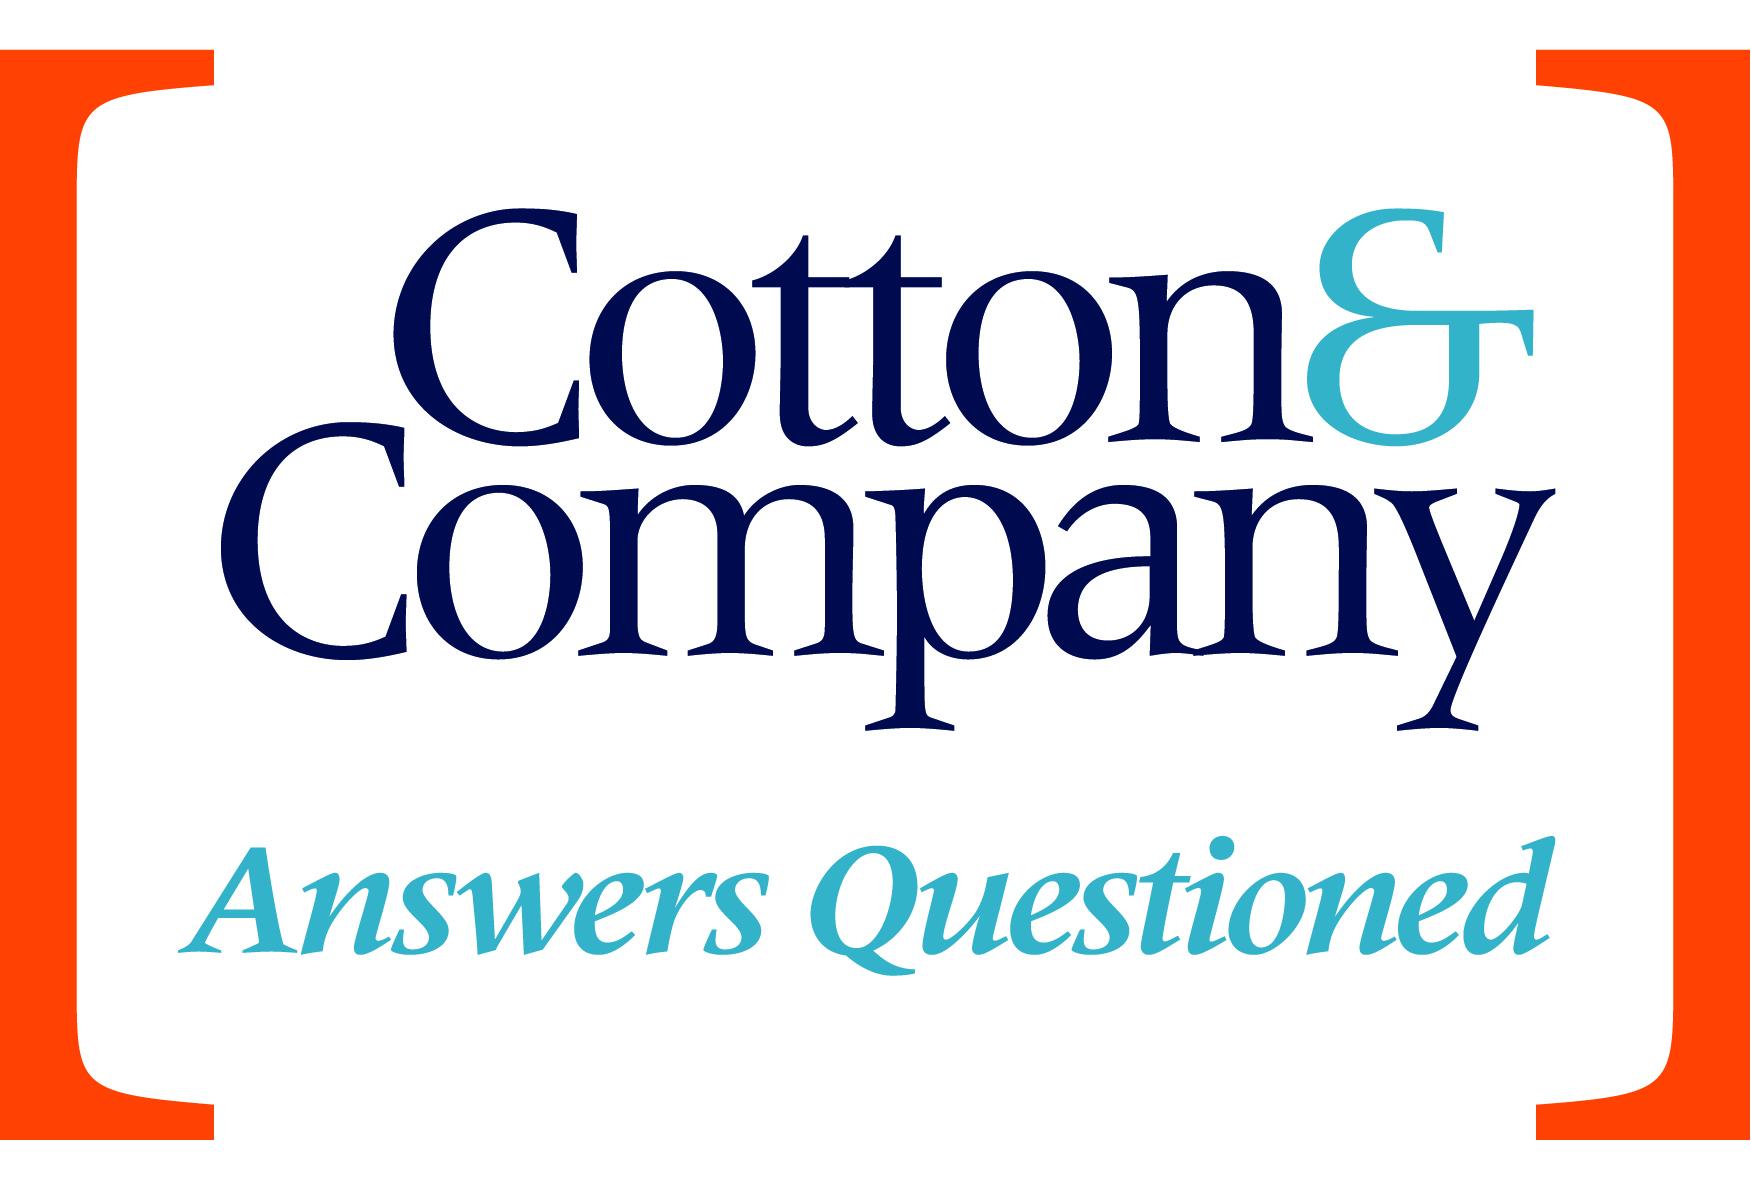 Cottonlogo_Tagline-navy-turq_Brackets hires2